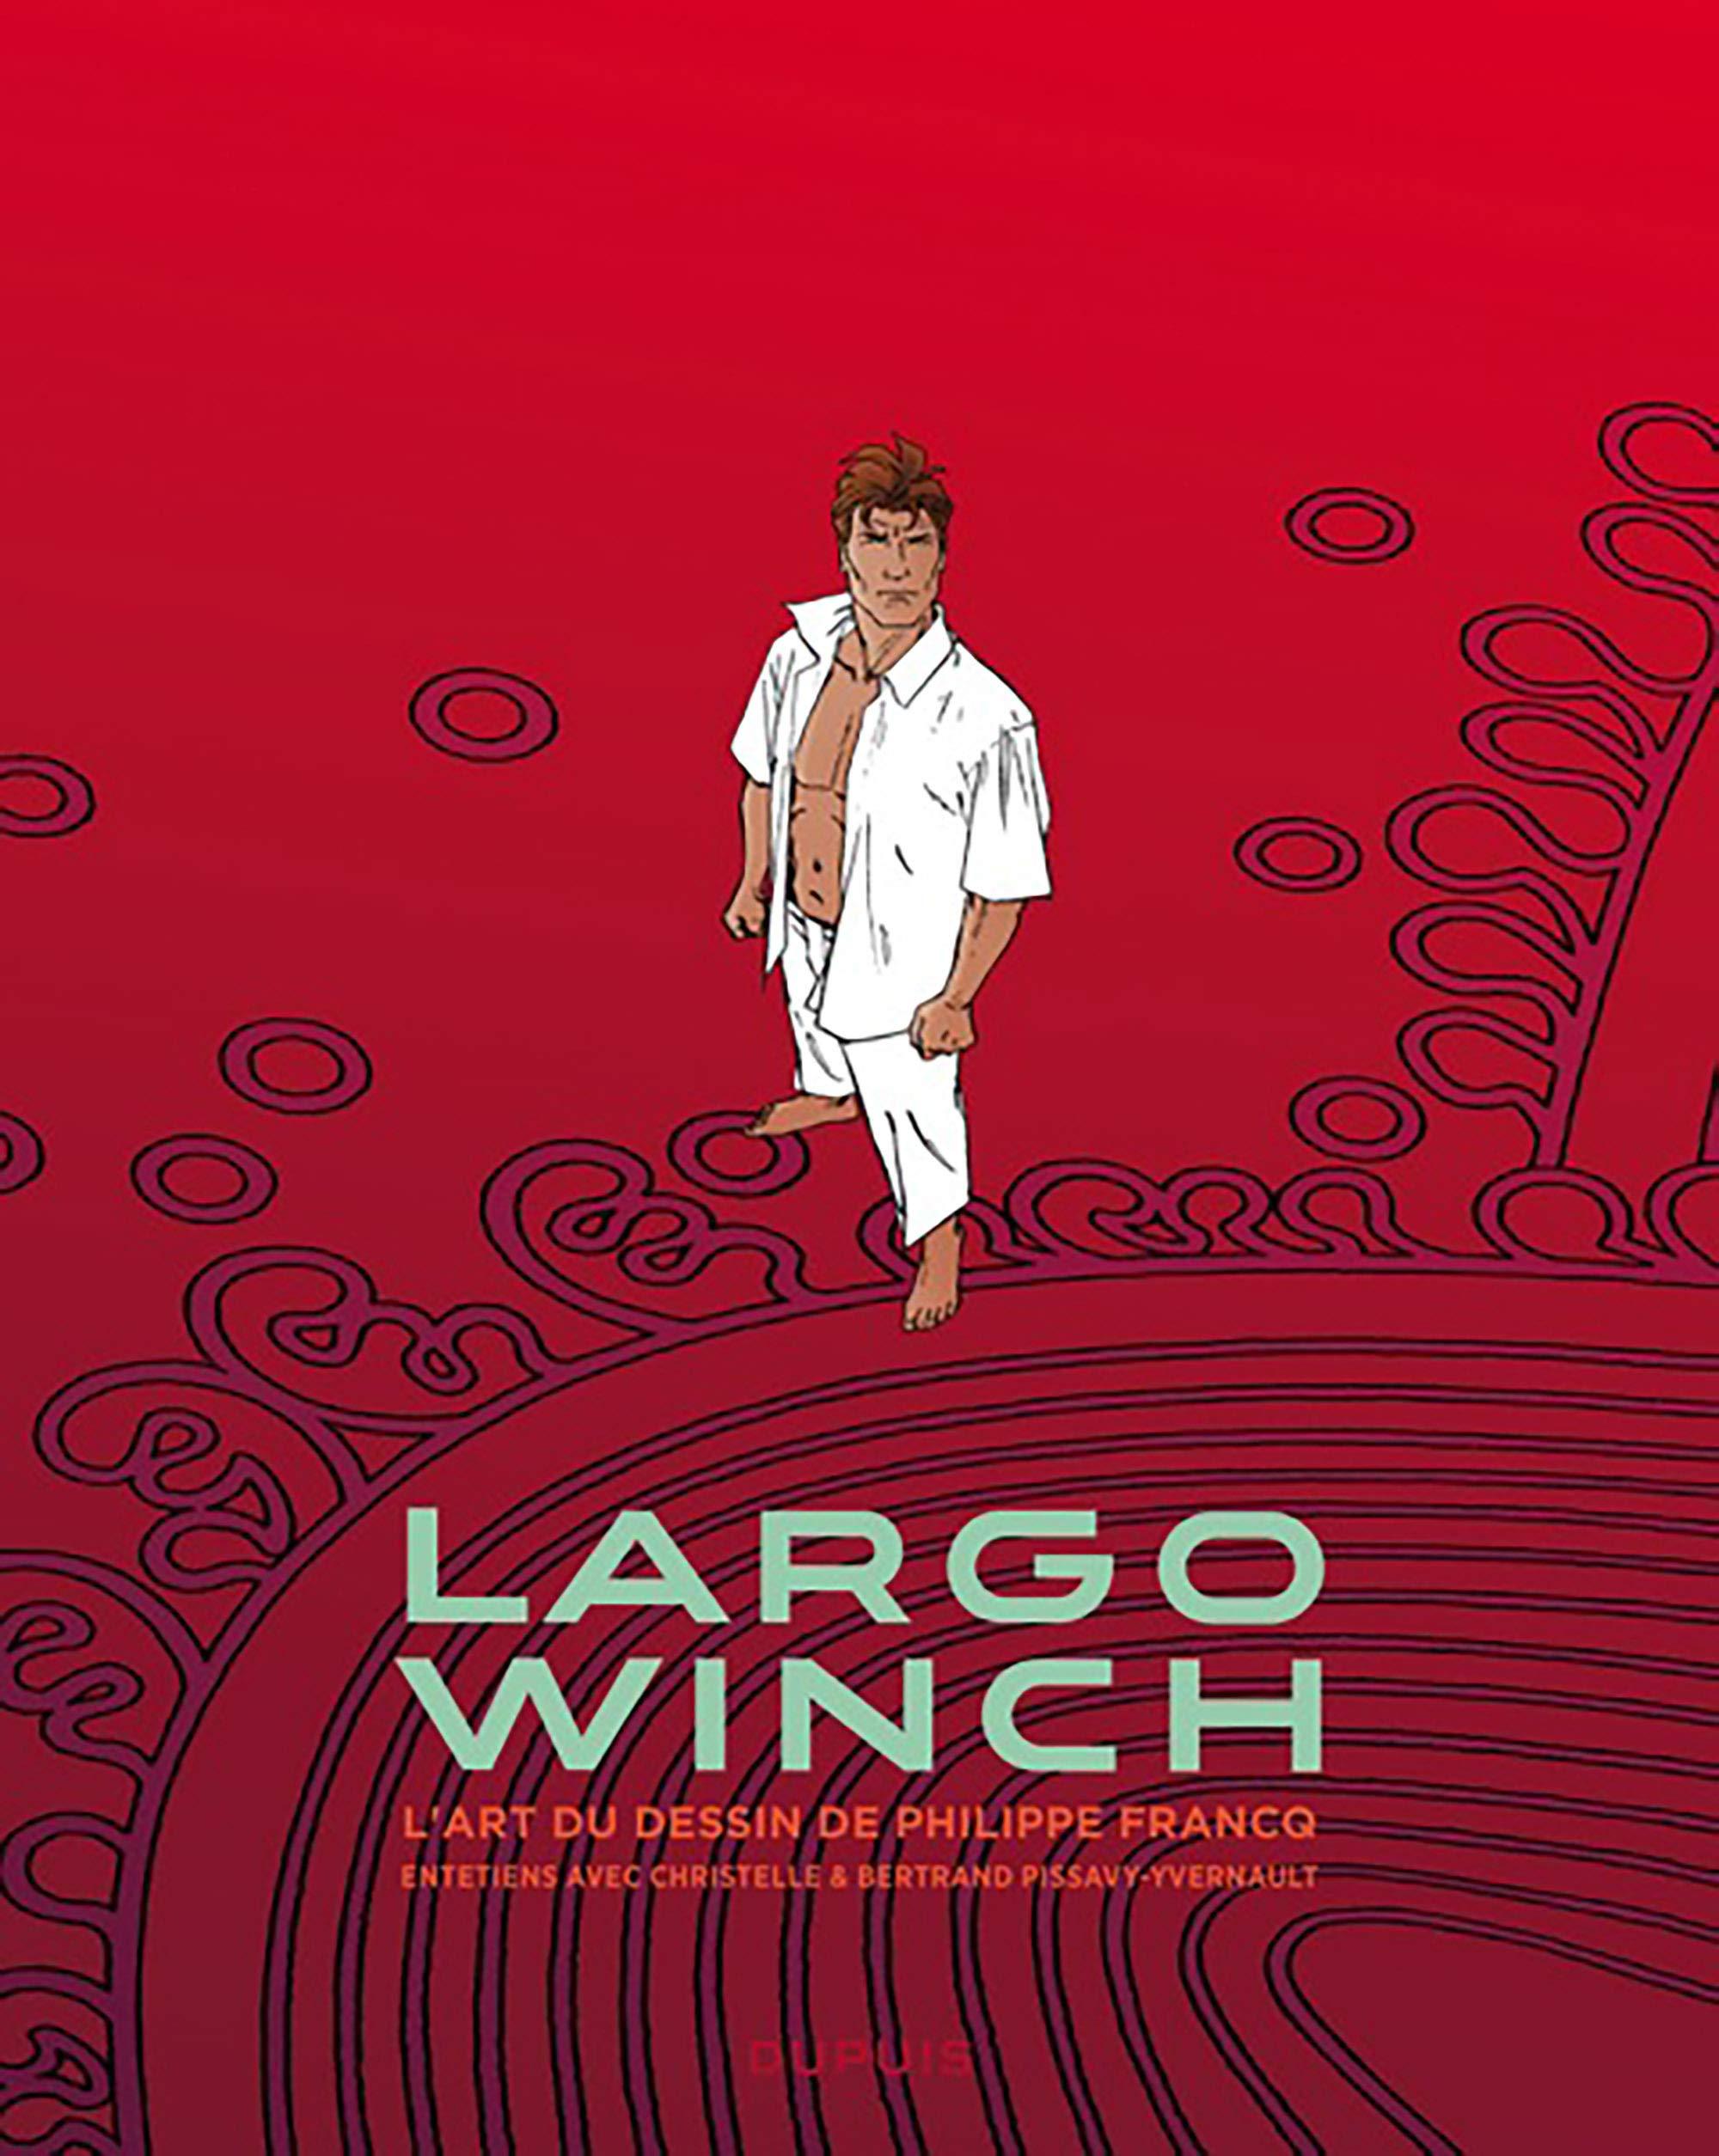 largo winch - Entretiens 1 - L'art du Dessin de Philippe Francq